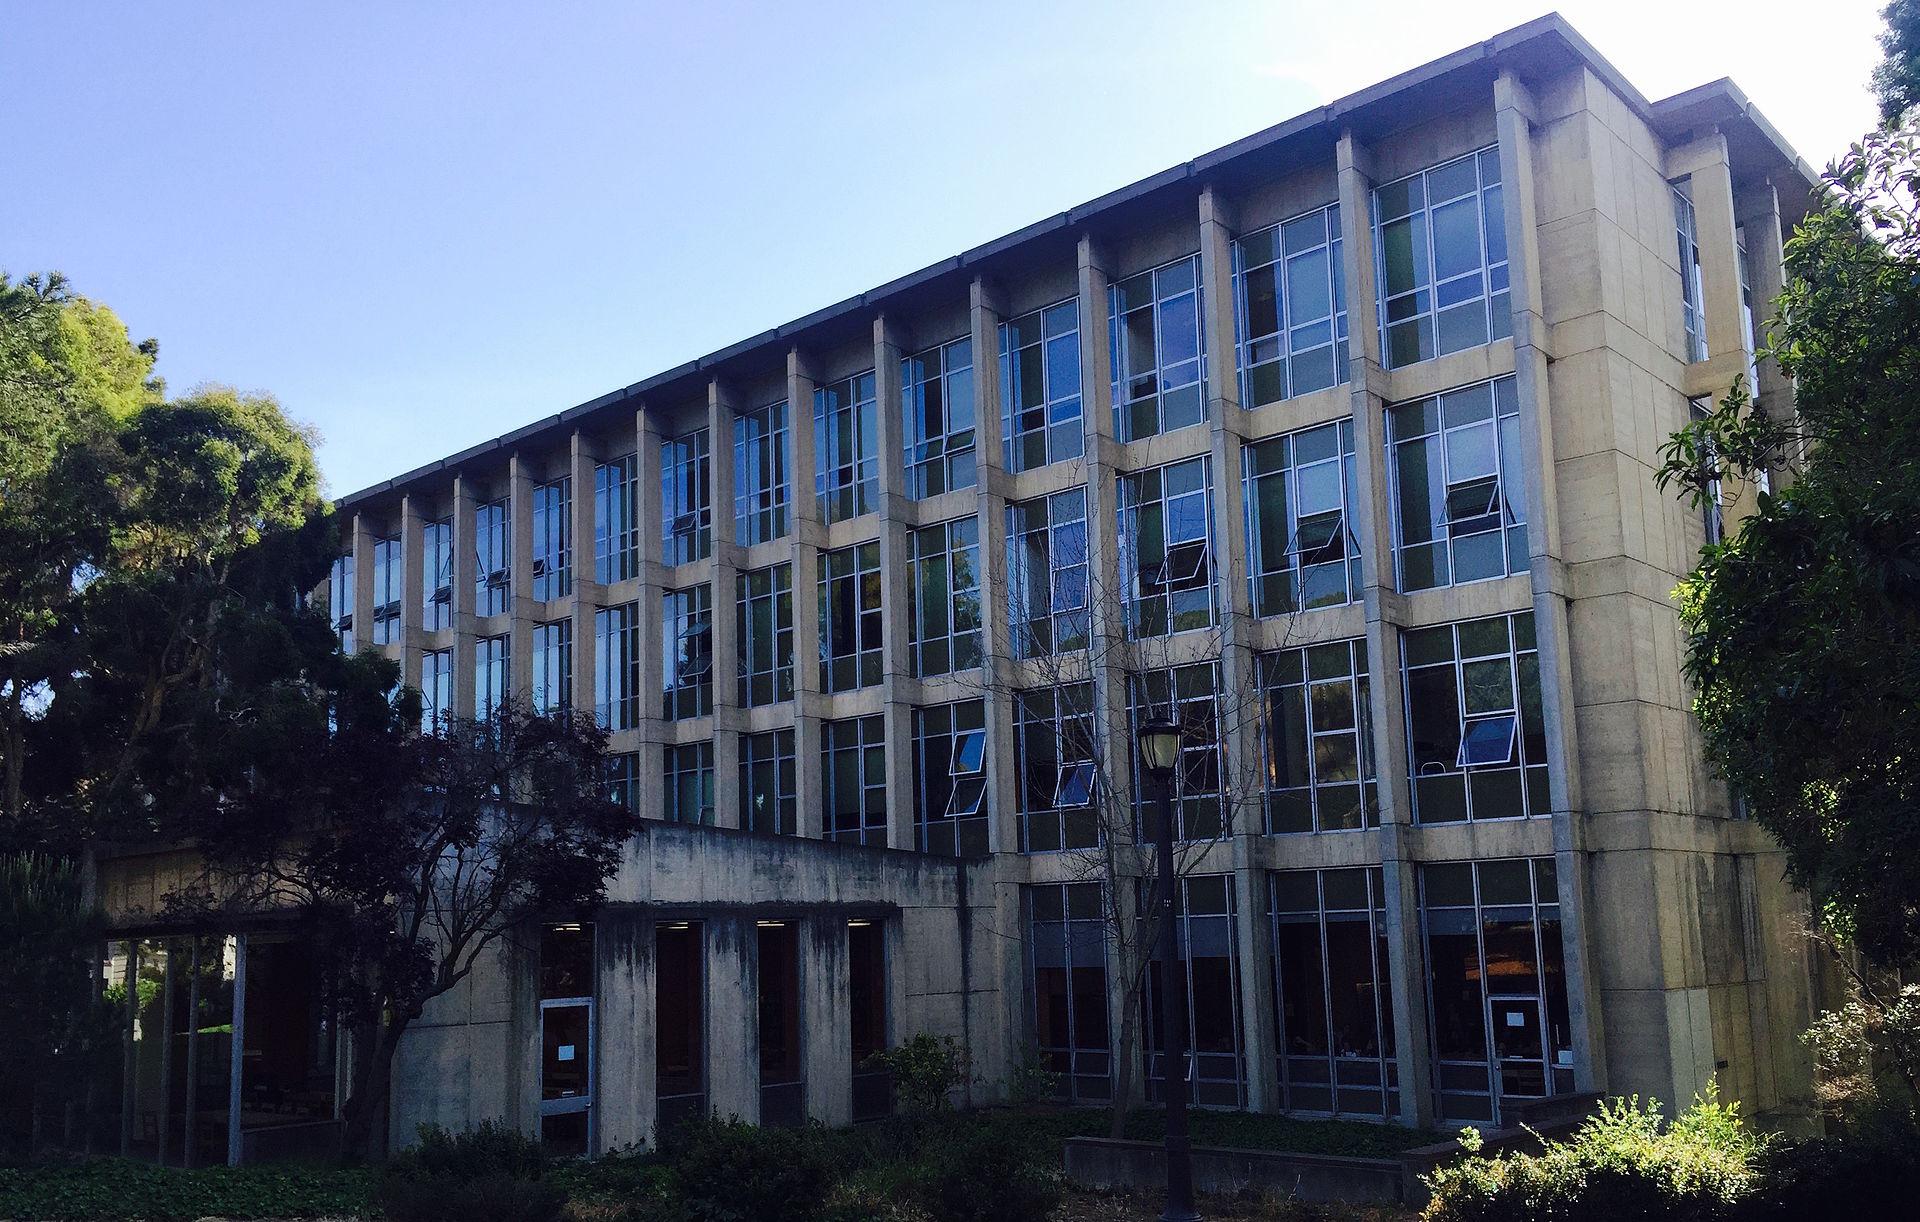 Uc Berkeley Graduate School Of Education  Wikipedia